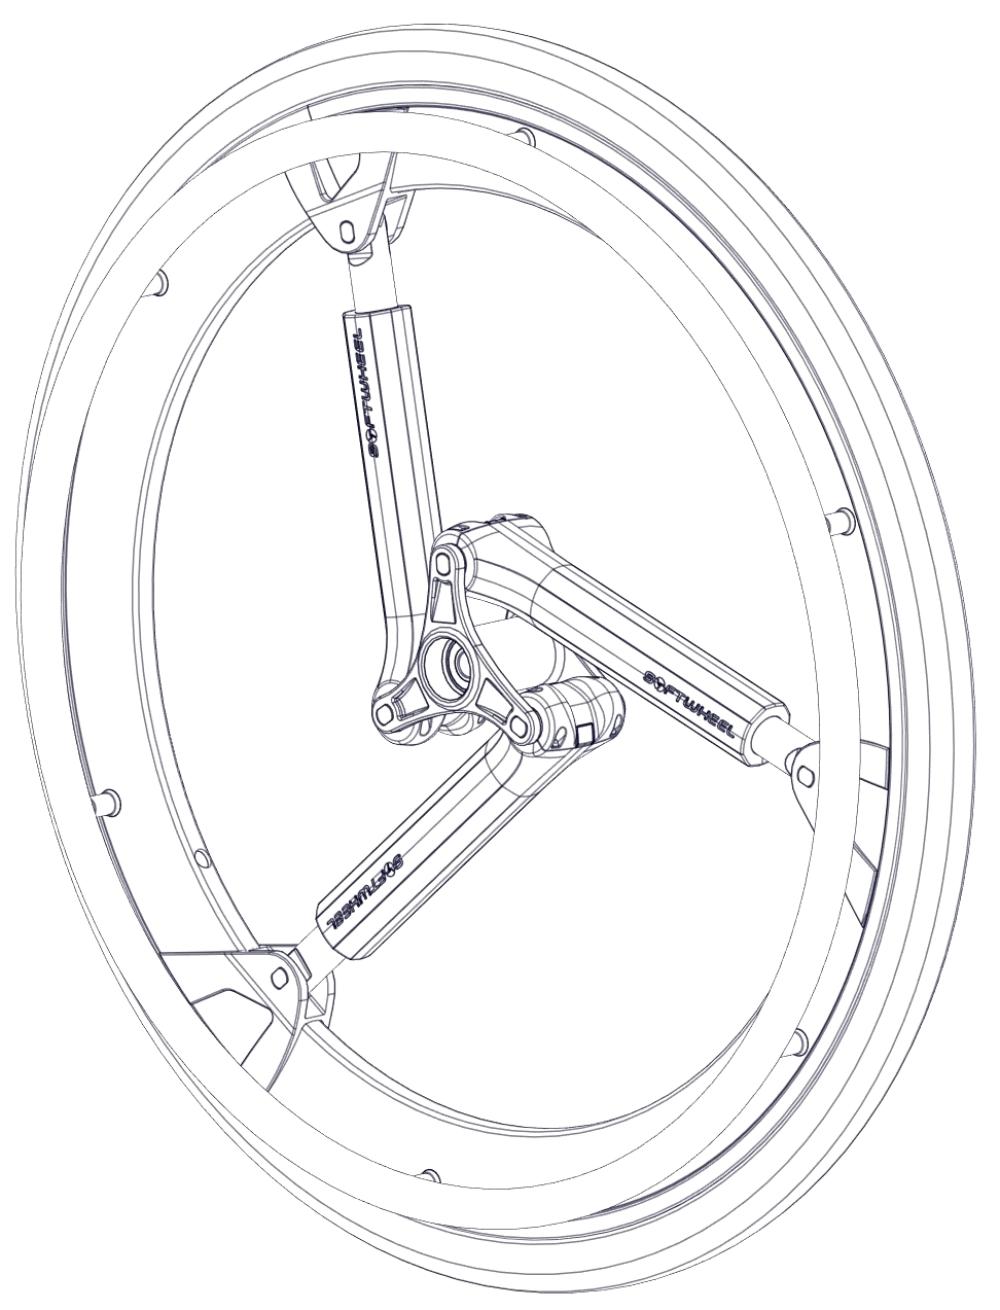 Softwheel / Tire / Handrim Kits parts diagram